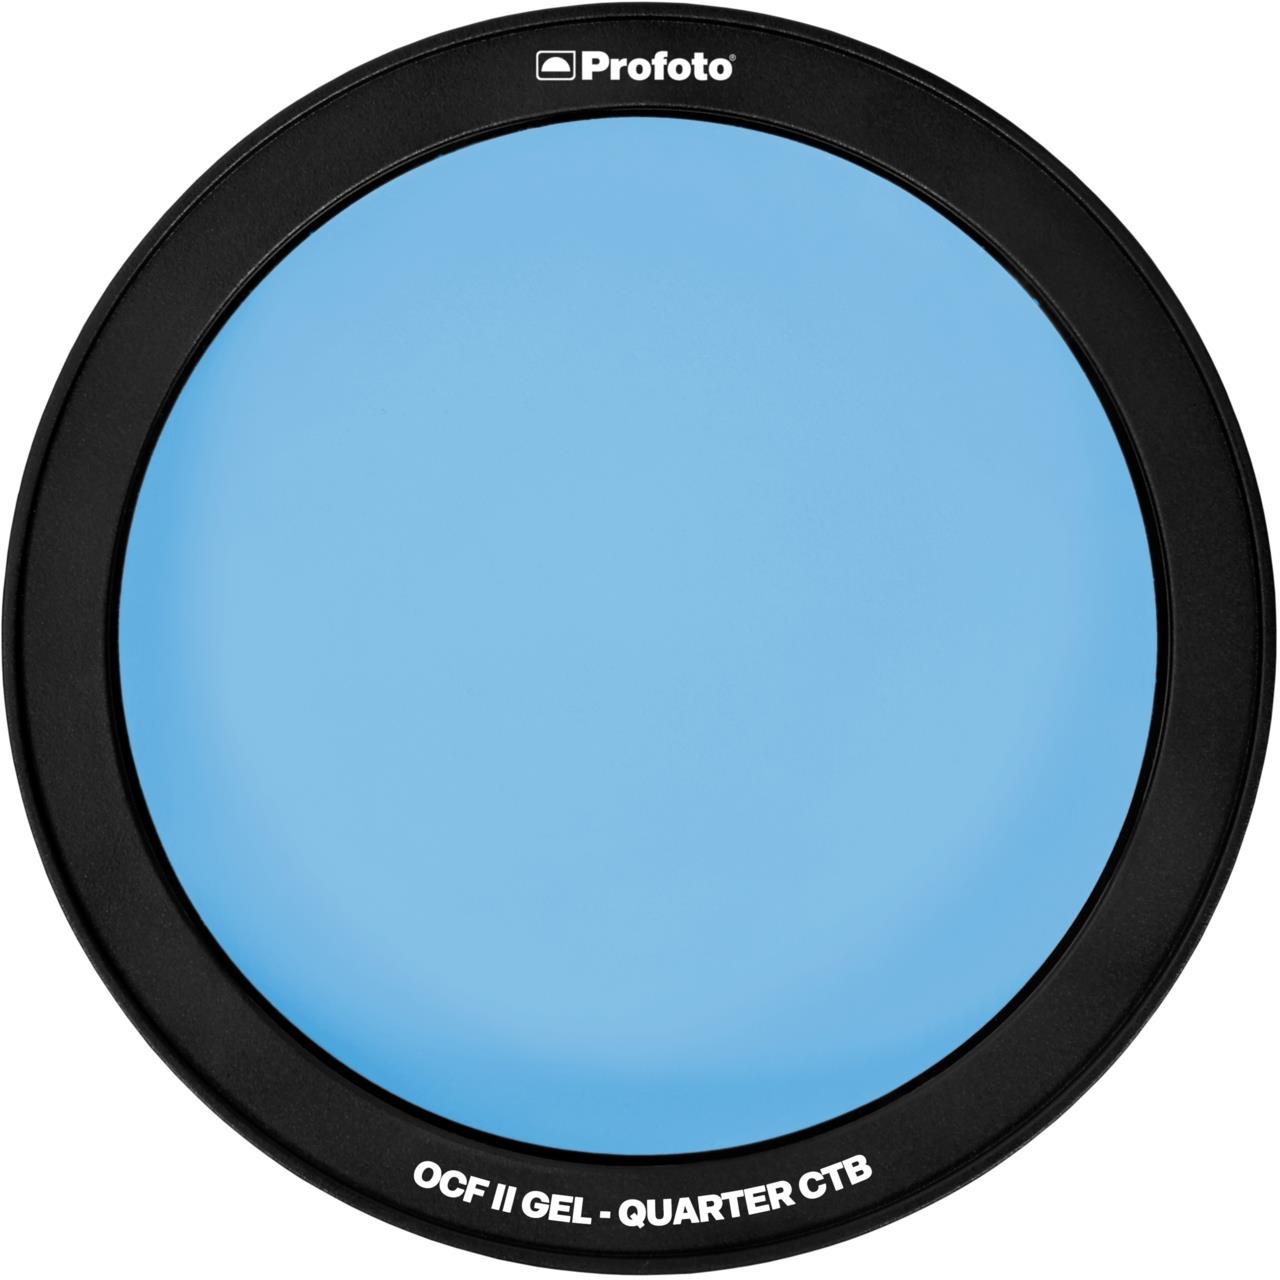 Profoto OCF II Gel - Quarter CTB